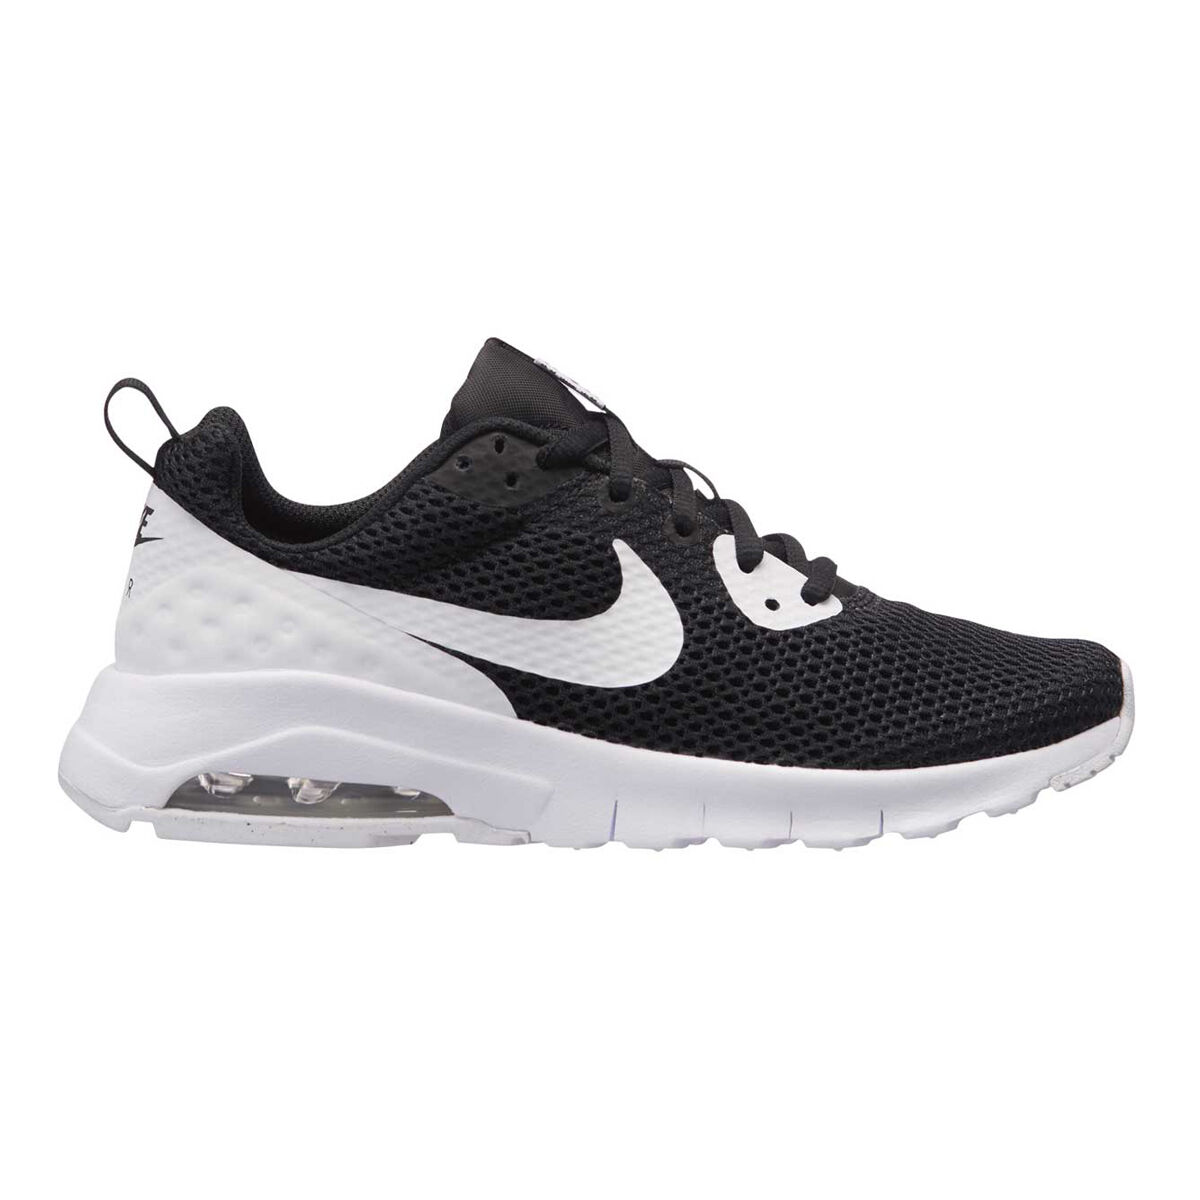 online retailer 17ab9 8e235 ... promo code nike air max motion low boys casual shoes black white us 6  black e28c7